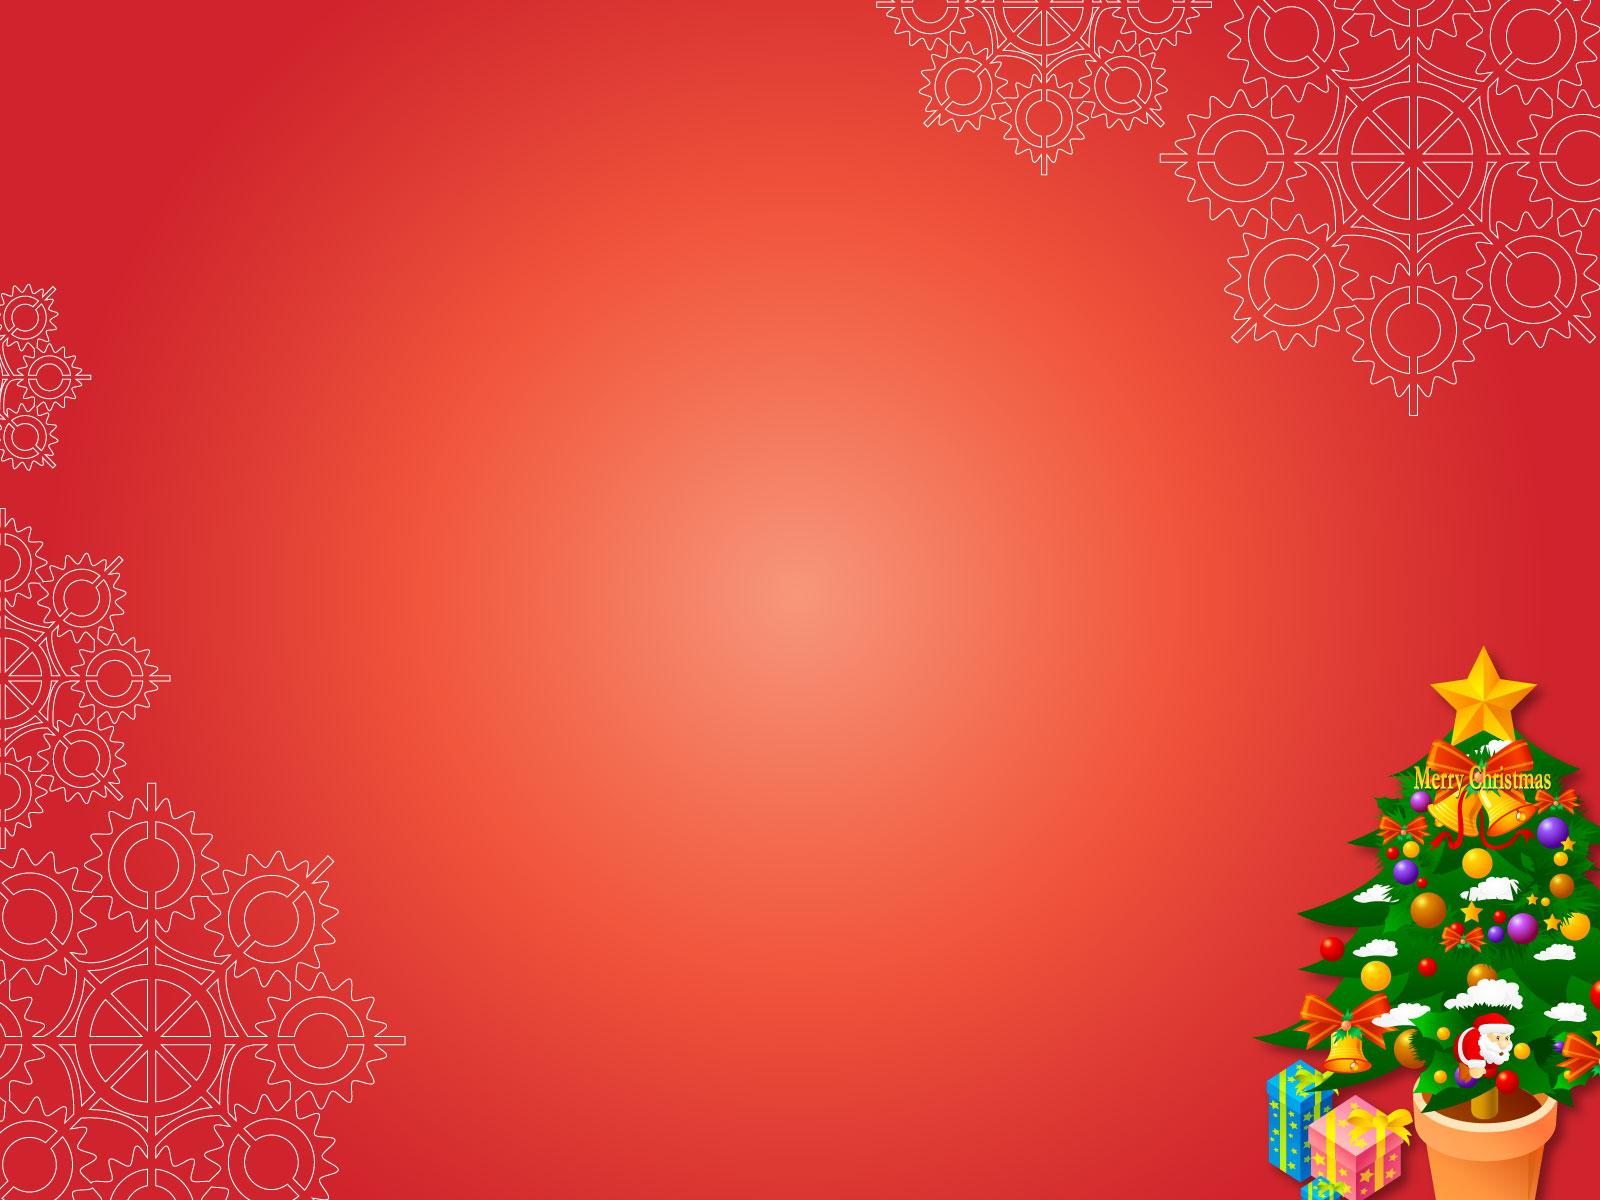 Labels: Christmas Backgrounds , Christmas Decor , Christmas Wallpapers